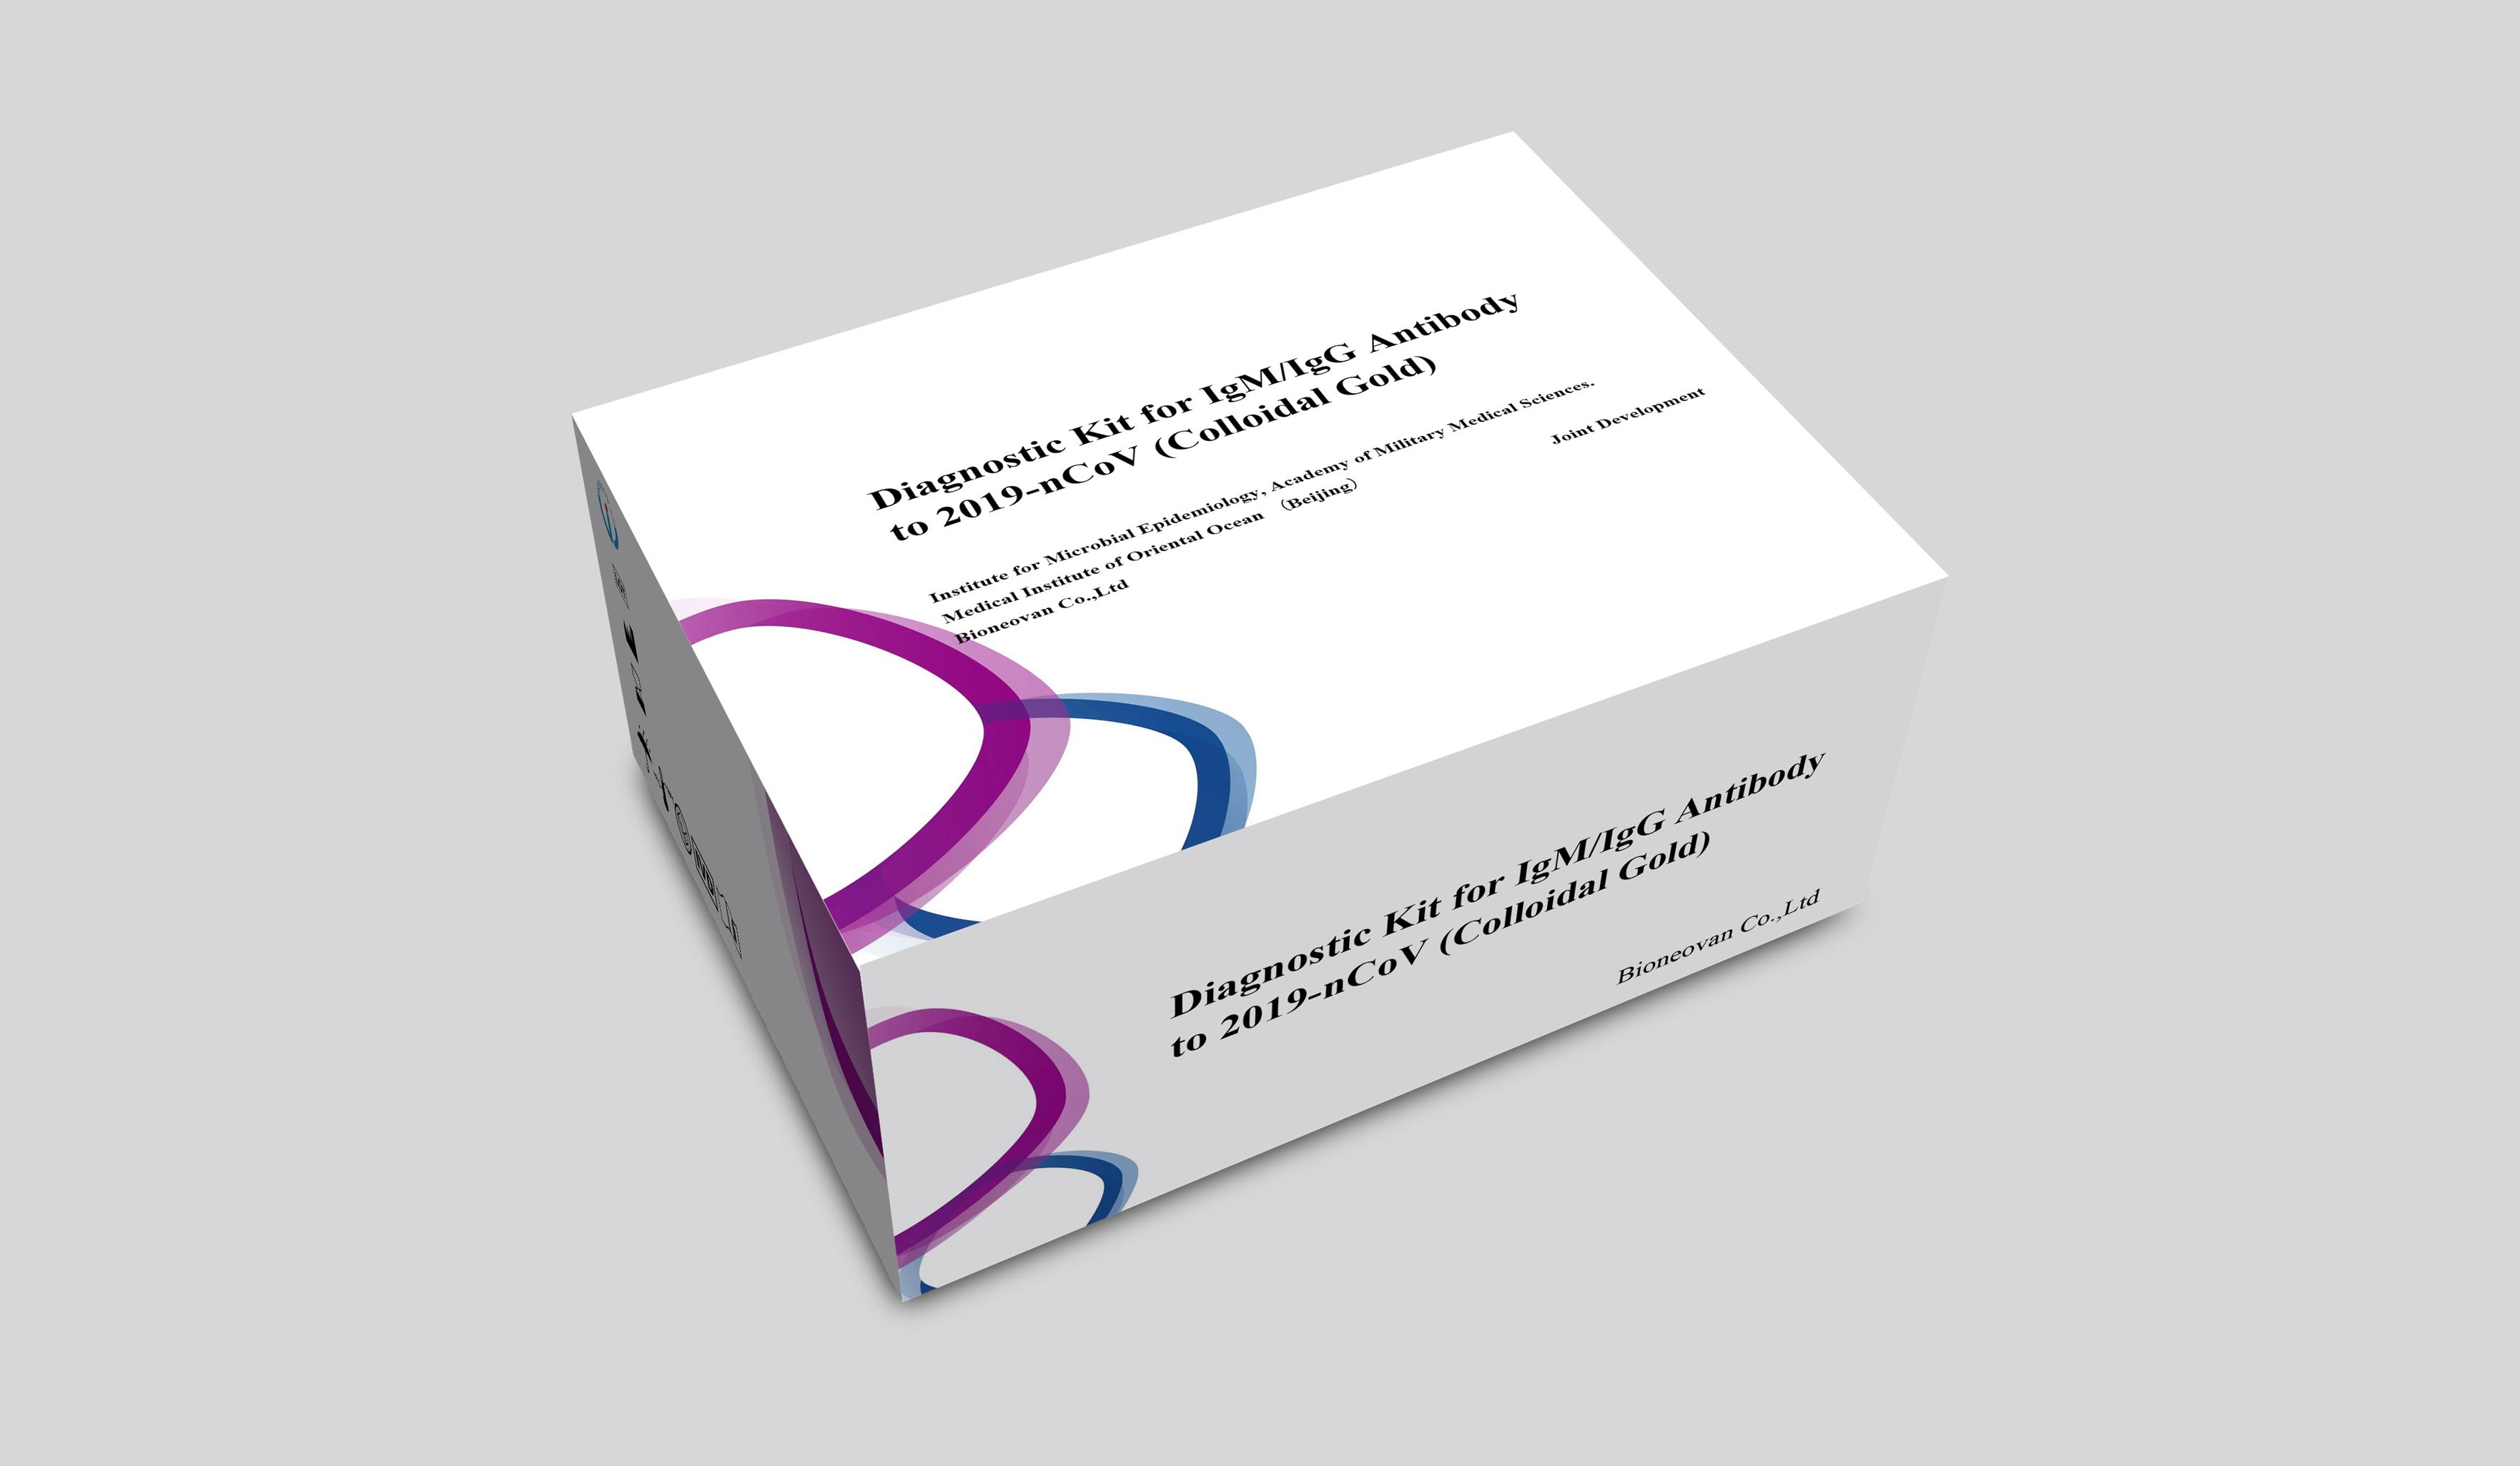 Diagnostic Kit for IgM/IgG Antibody to 2019-nCoV(Colloidal Gold)